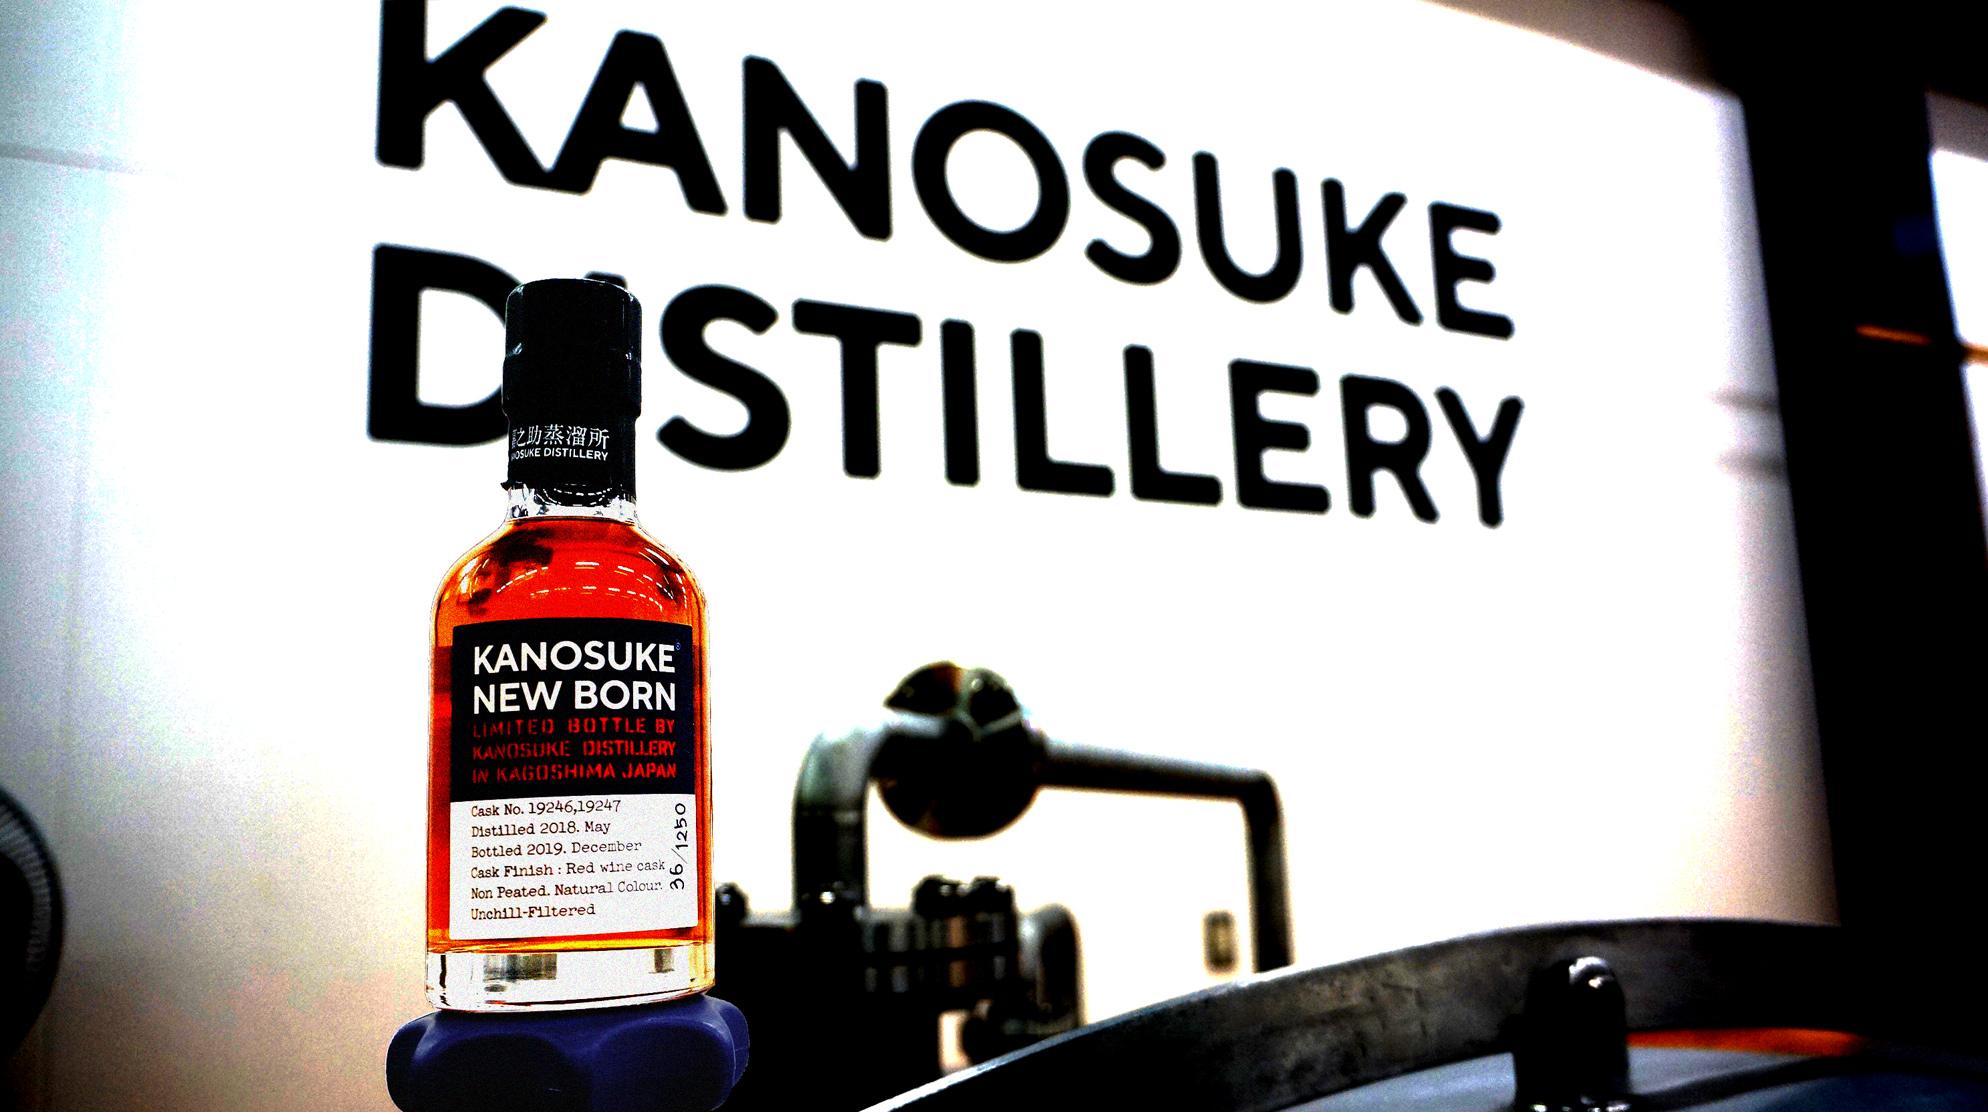 NEW BORN Kanosuke Distillery Limited Bottle